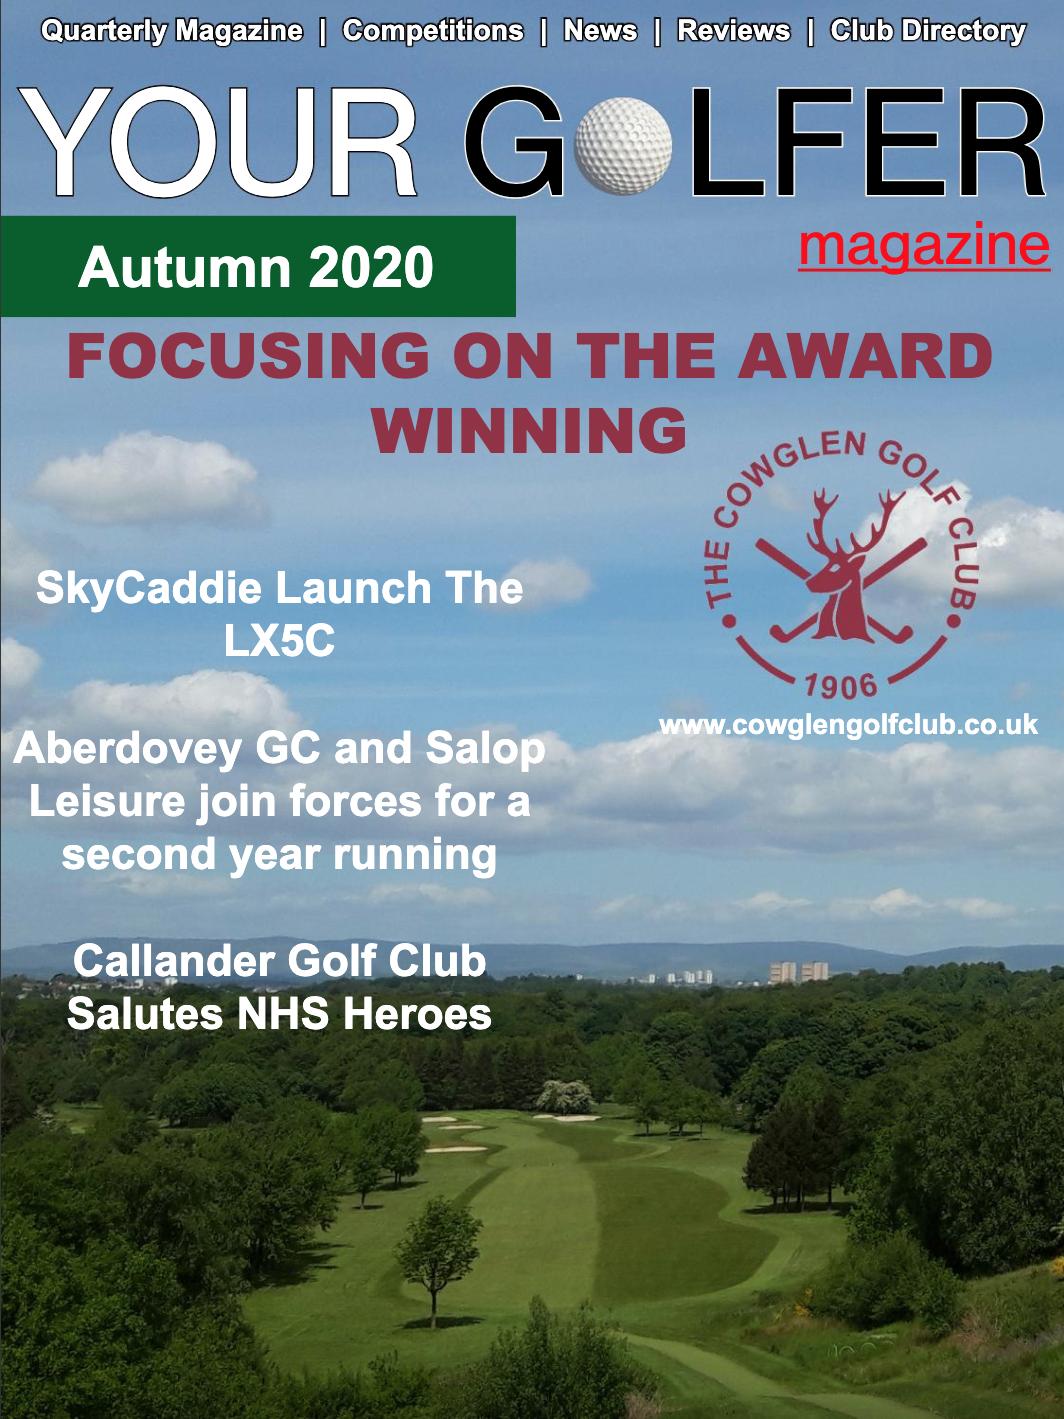 Autumn 2020 Edition of Your Golfer Magazine